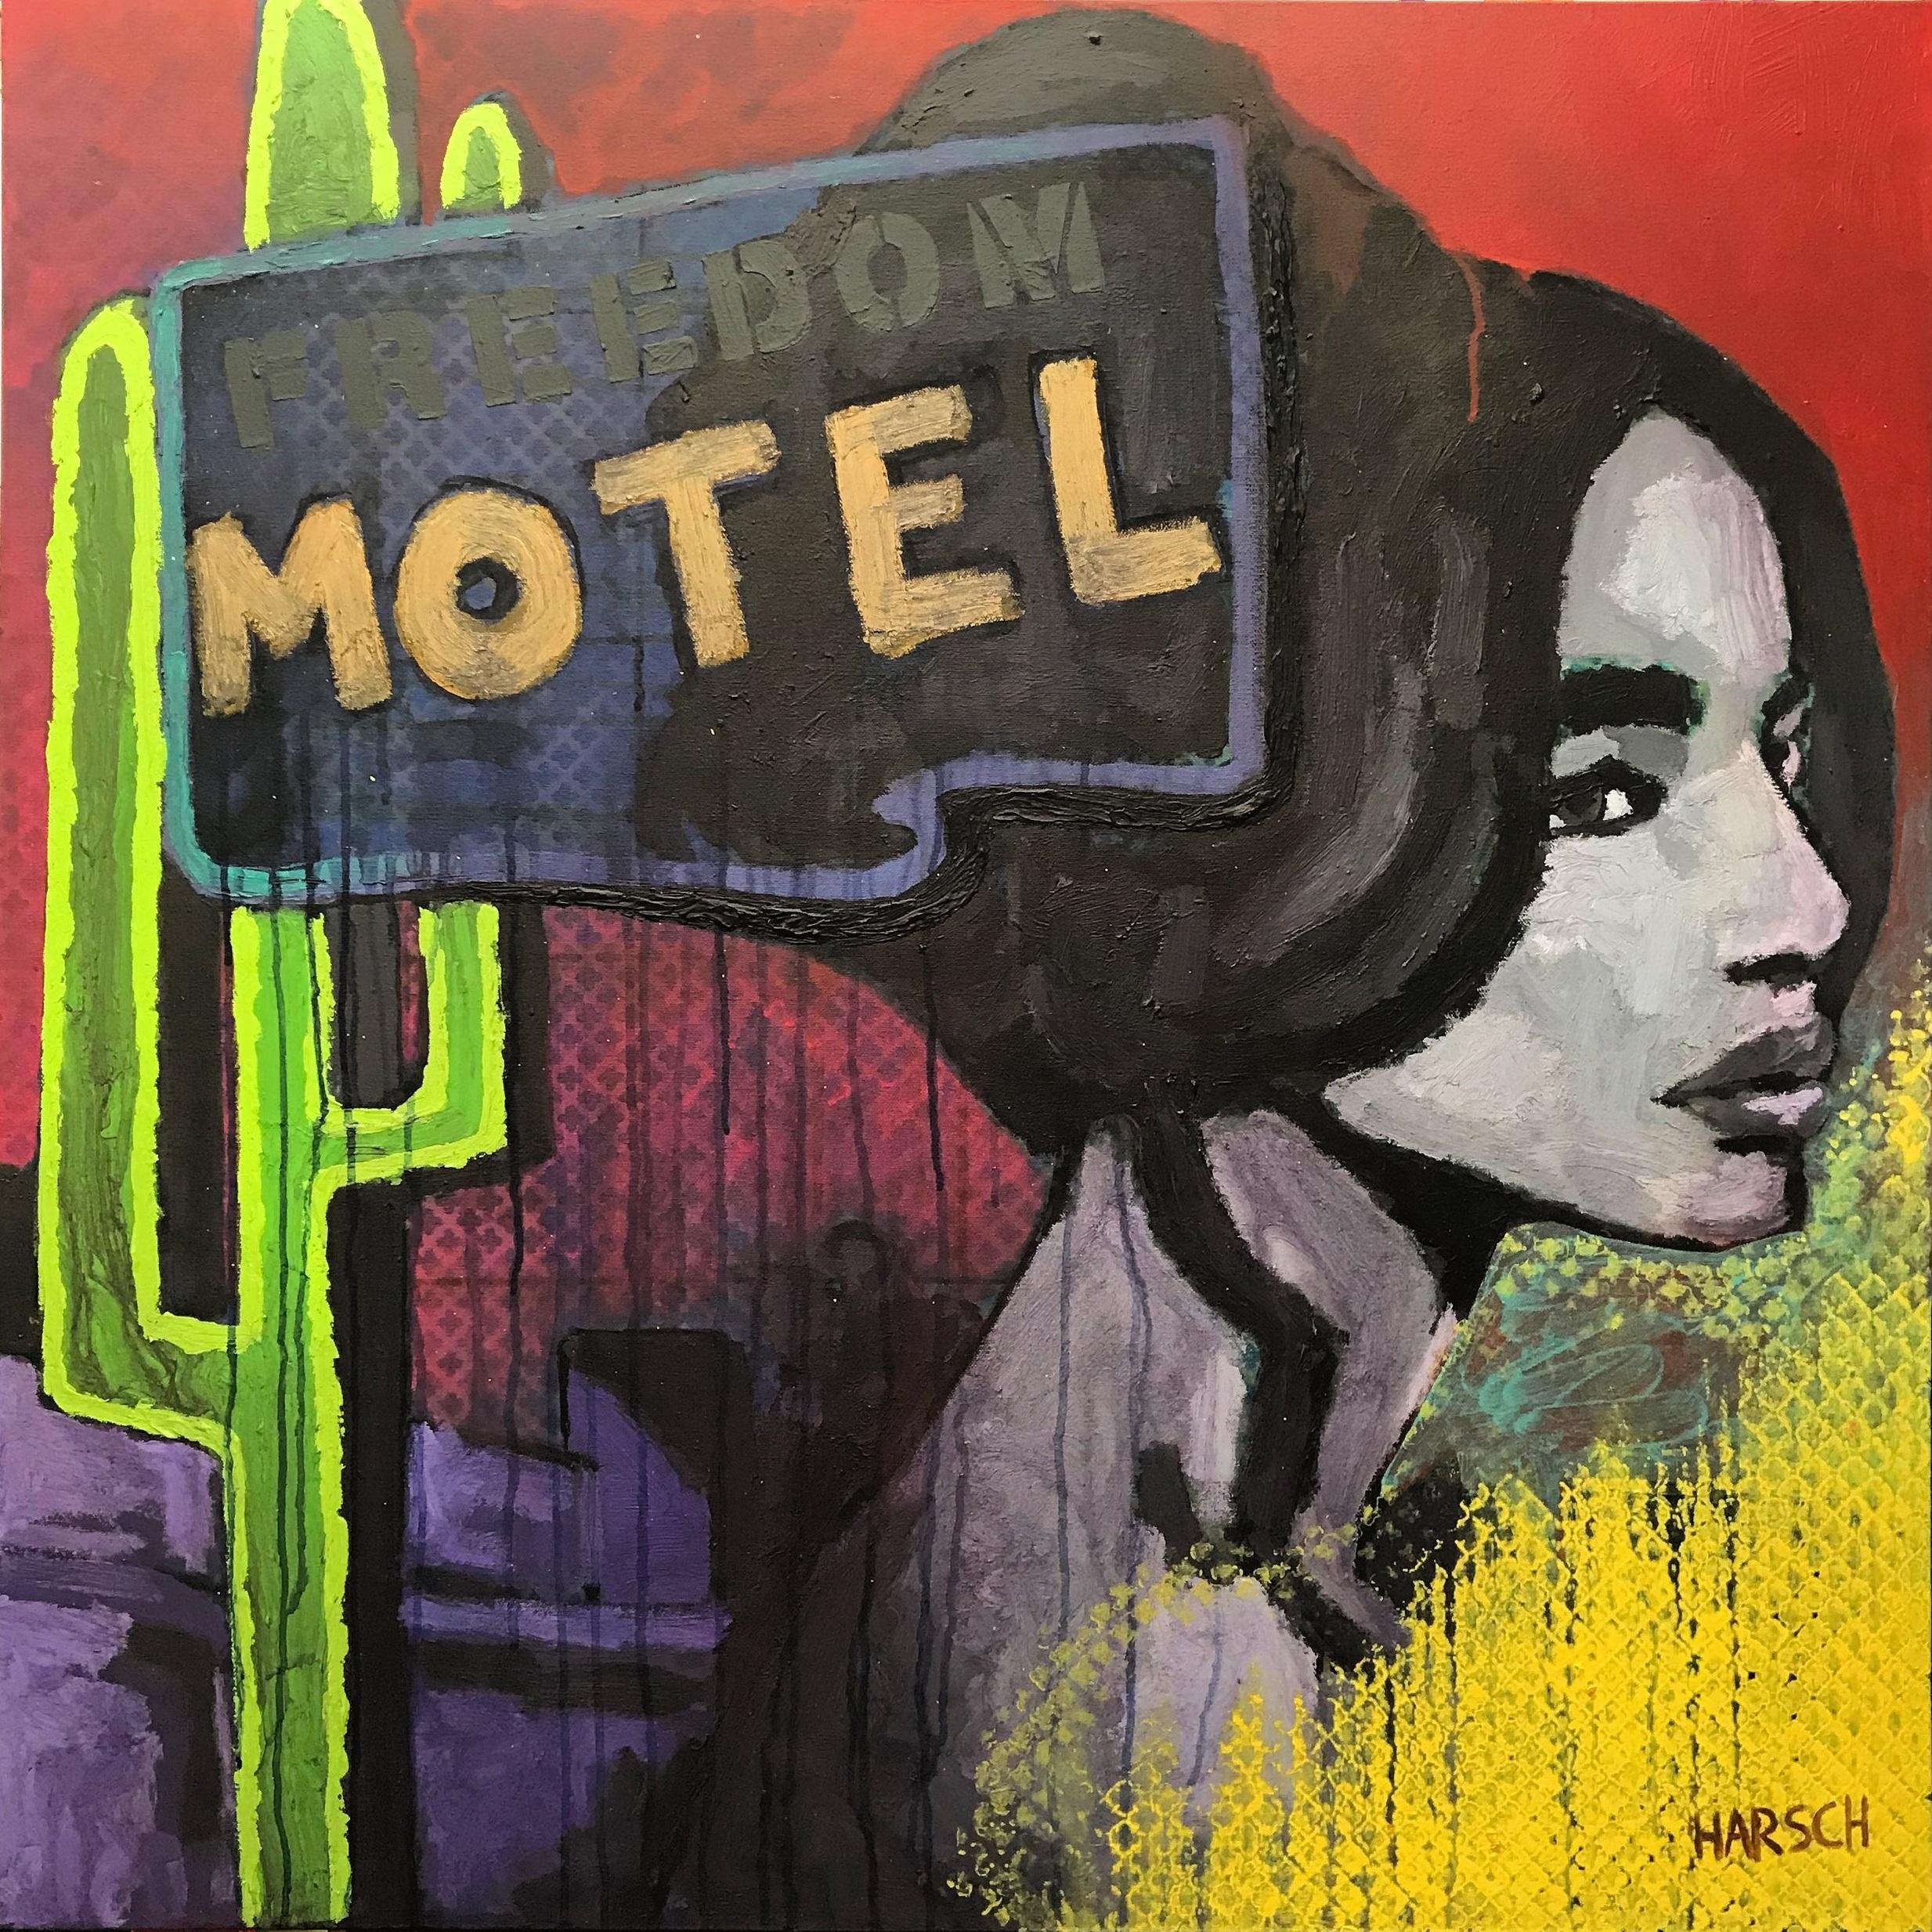 Freedom Motel